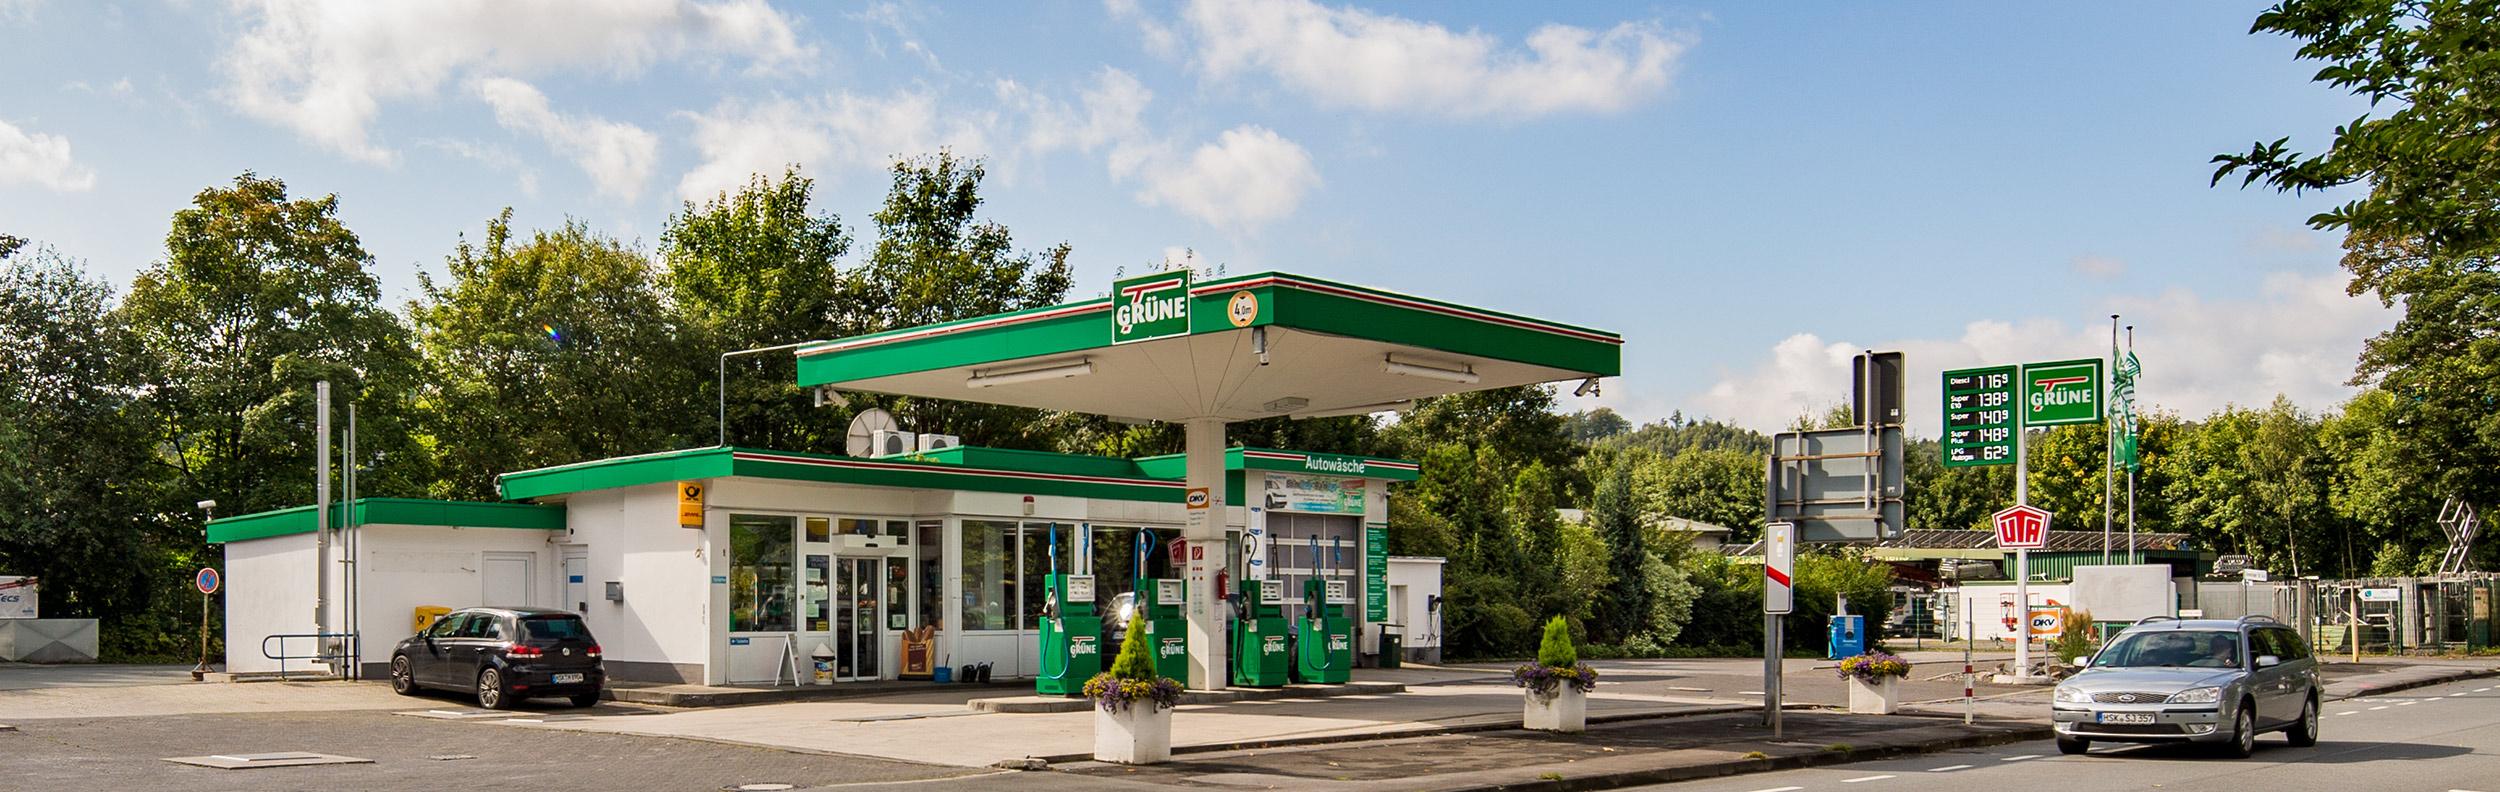 gruene-tankstellen-sauerland-002